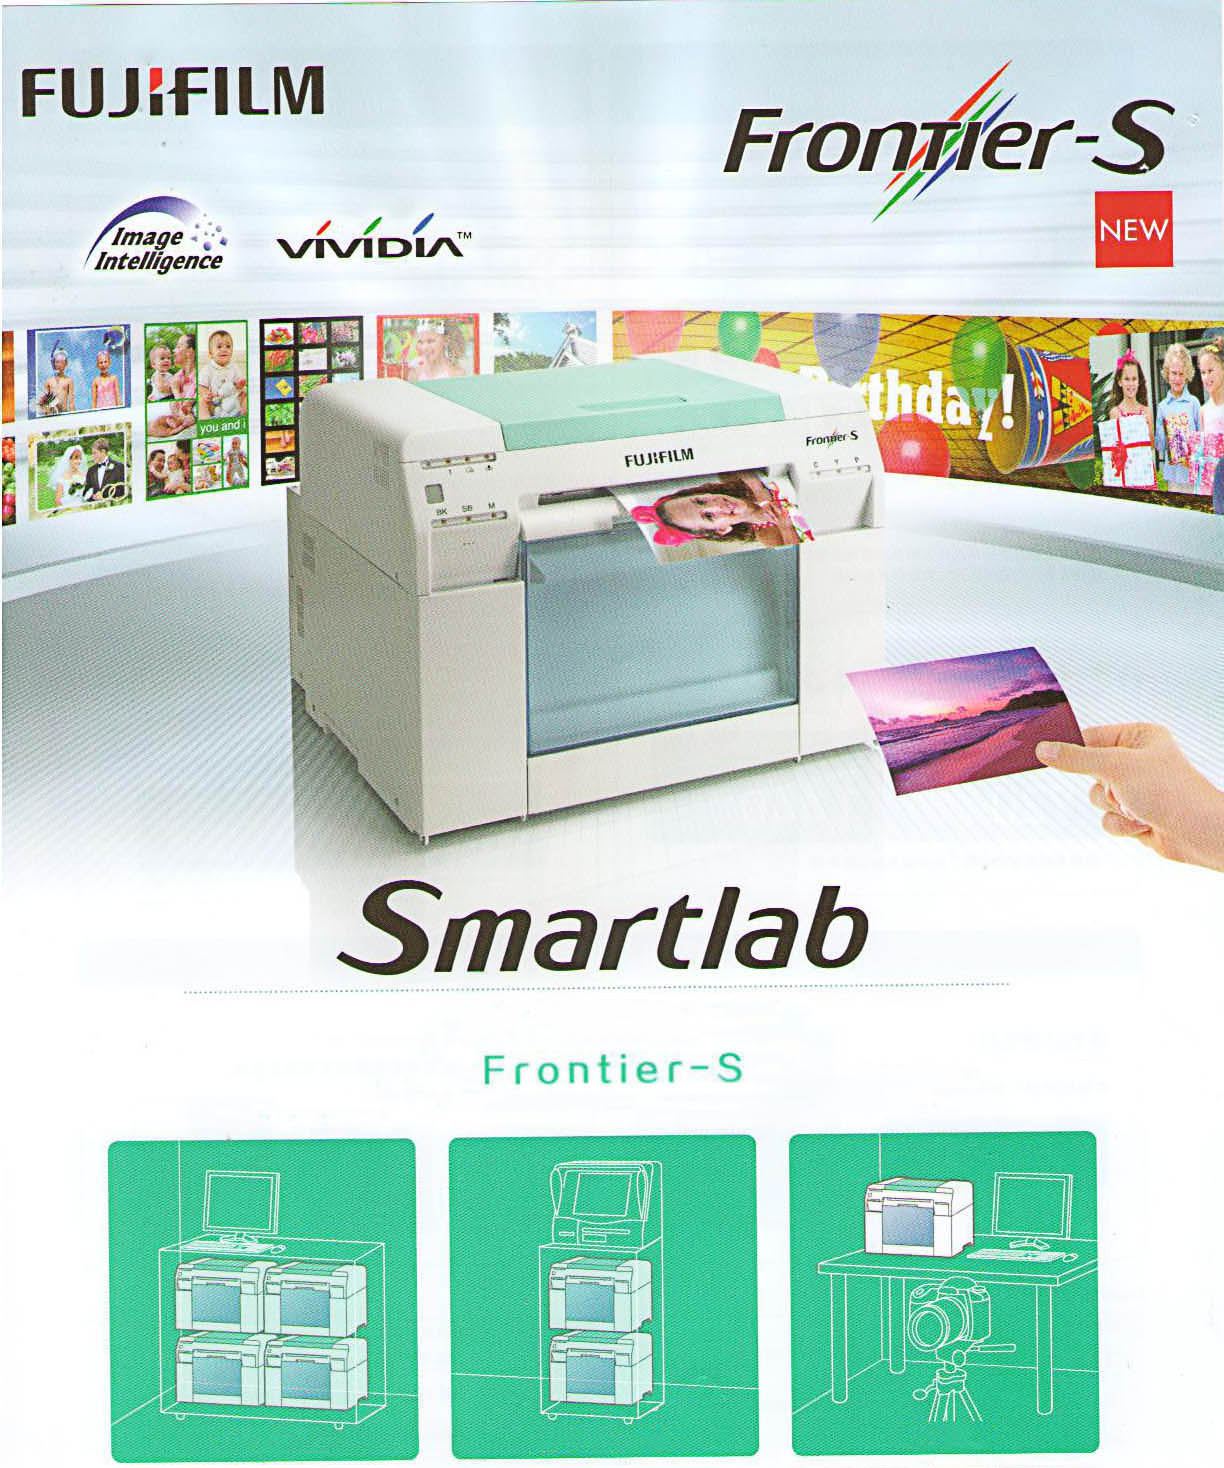 Fujifilm Frontier-S photo printer